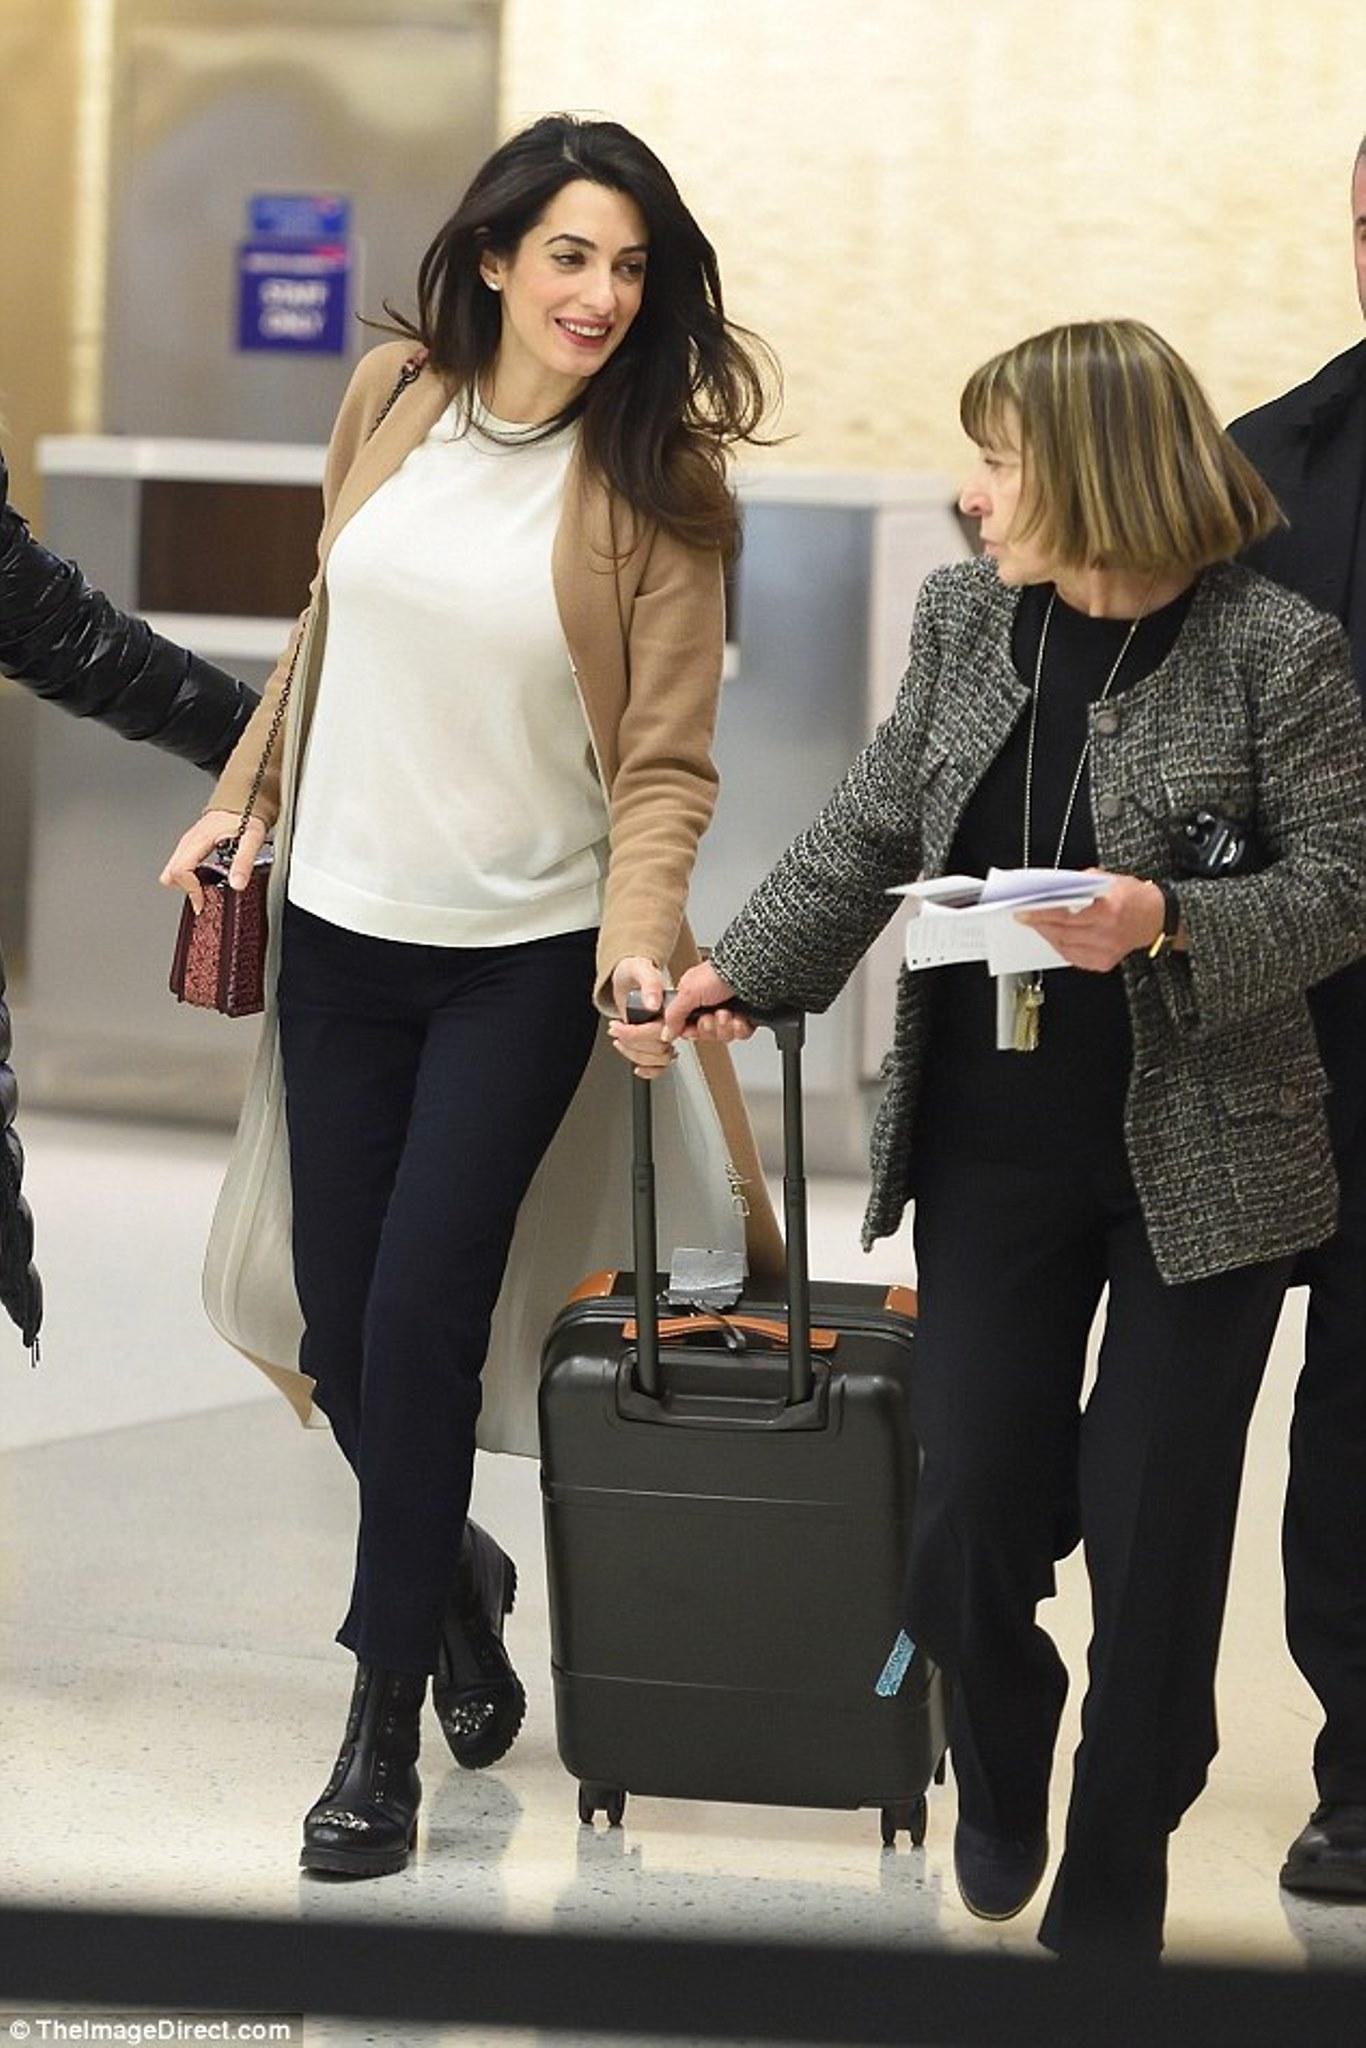 Amal Clooney Leaving New York On 10 03 2017 Amal Clooney